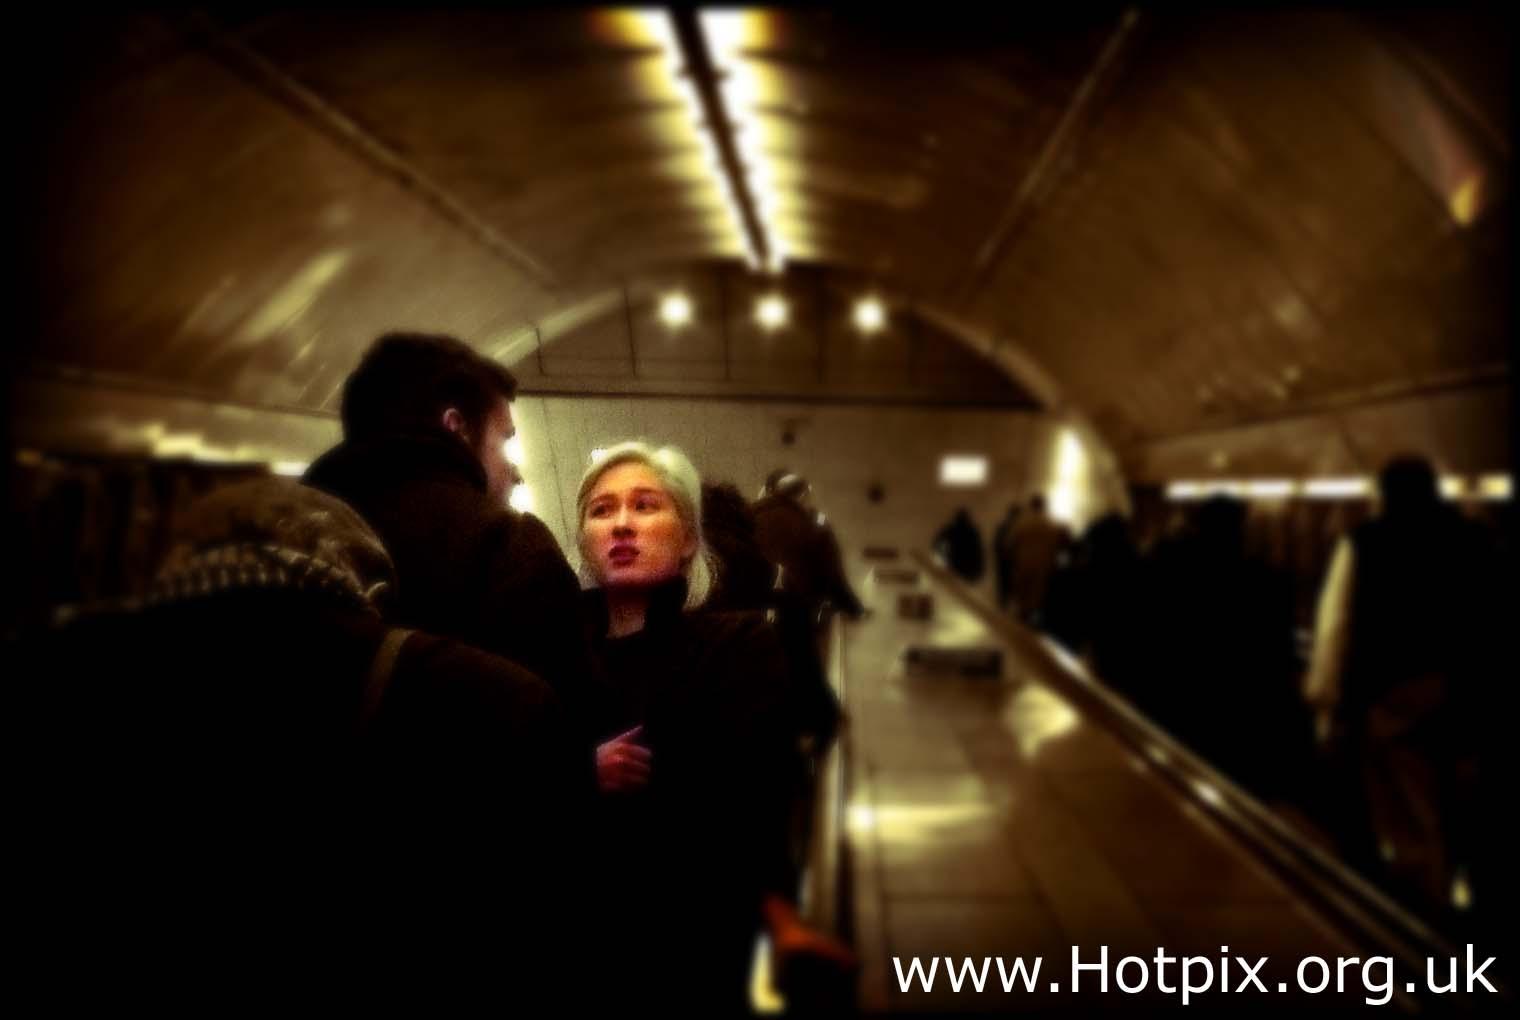 tony,smith,hotpix,tube,subway,tunnel,love,lovers,girl,female,blond,romance,sepia,dark,night,man,sex,sexy,london,england,UK,great,britain,#tonysmith,#tonysmithhotpix